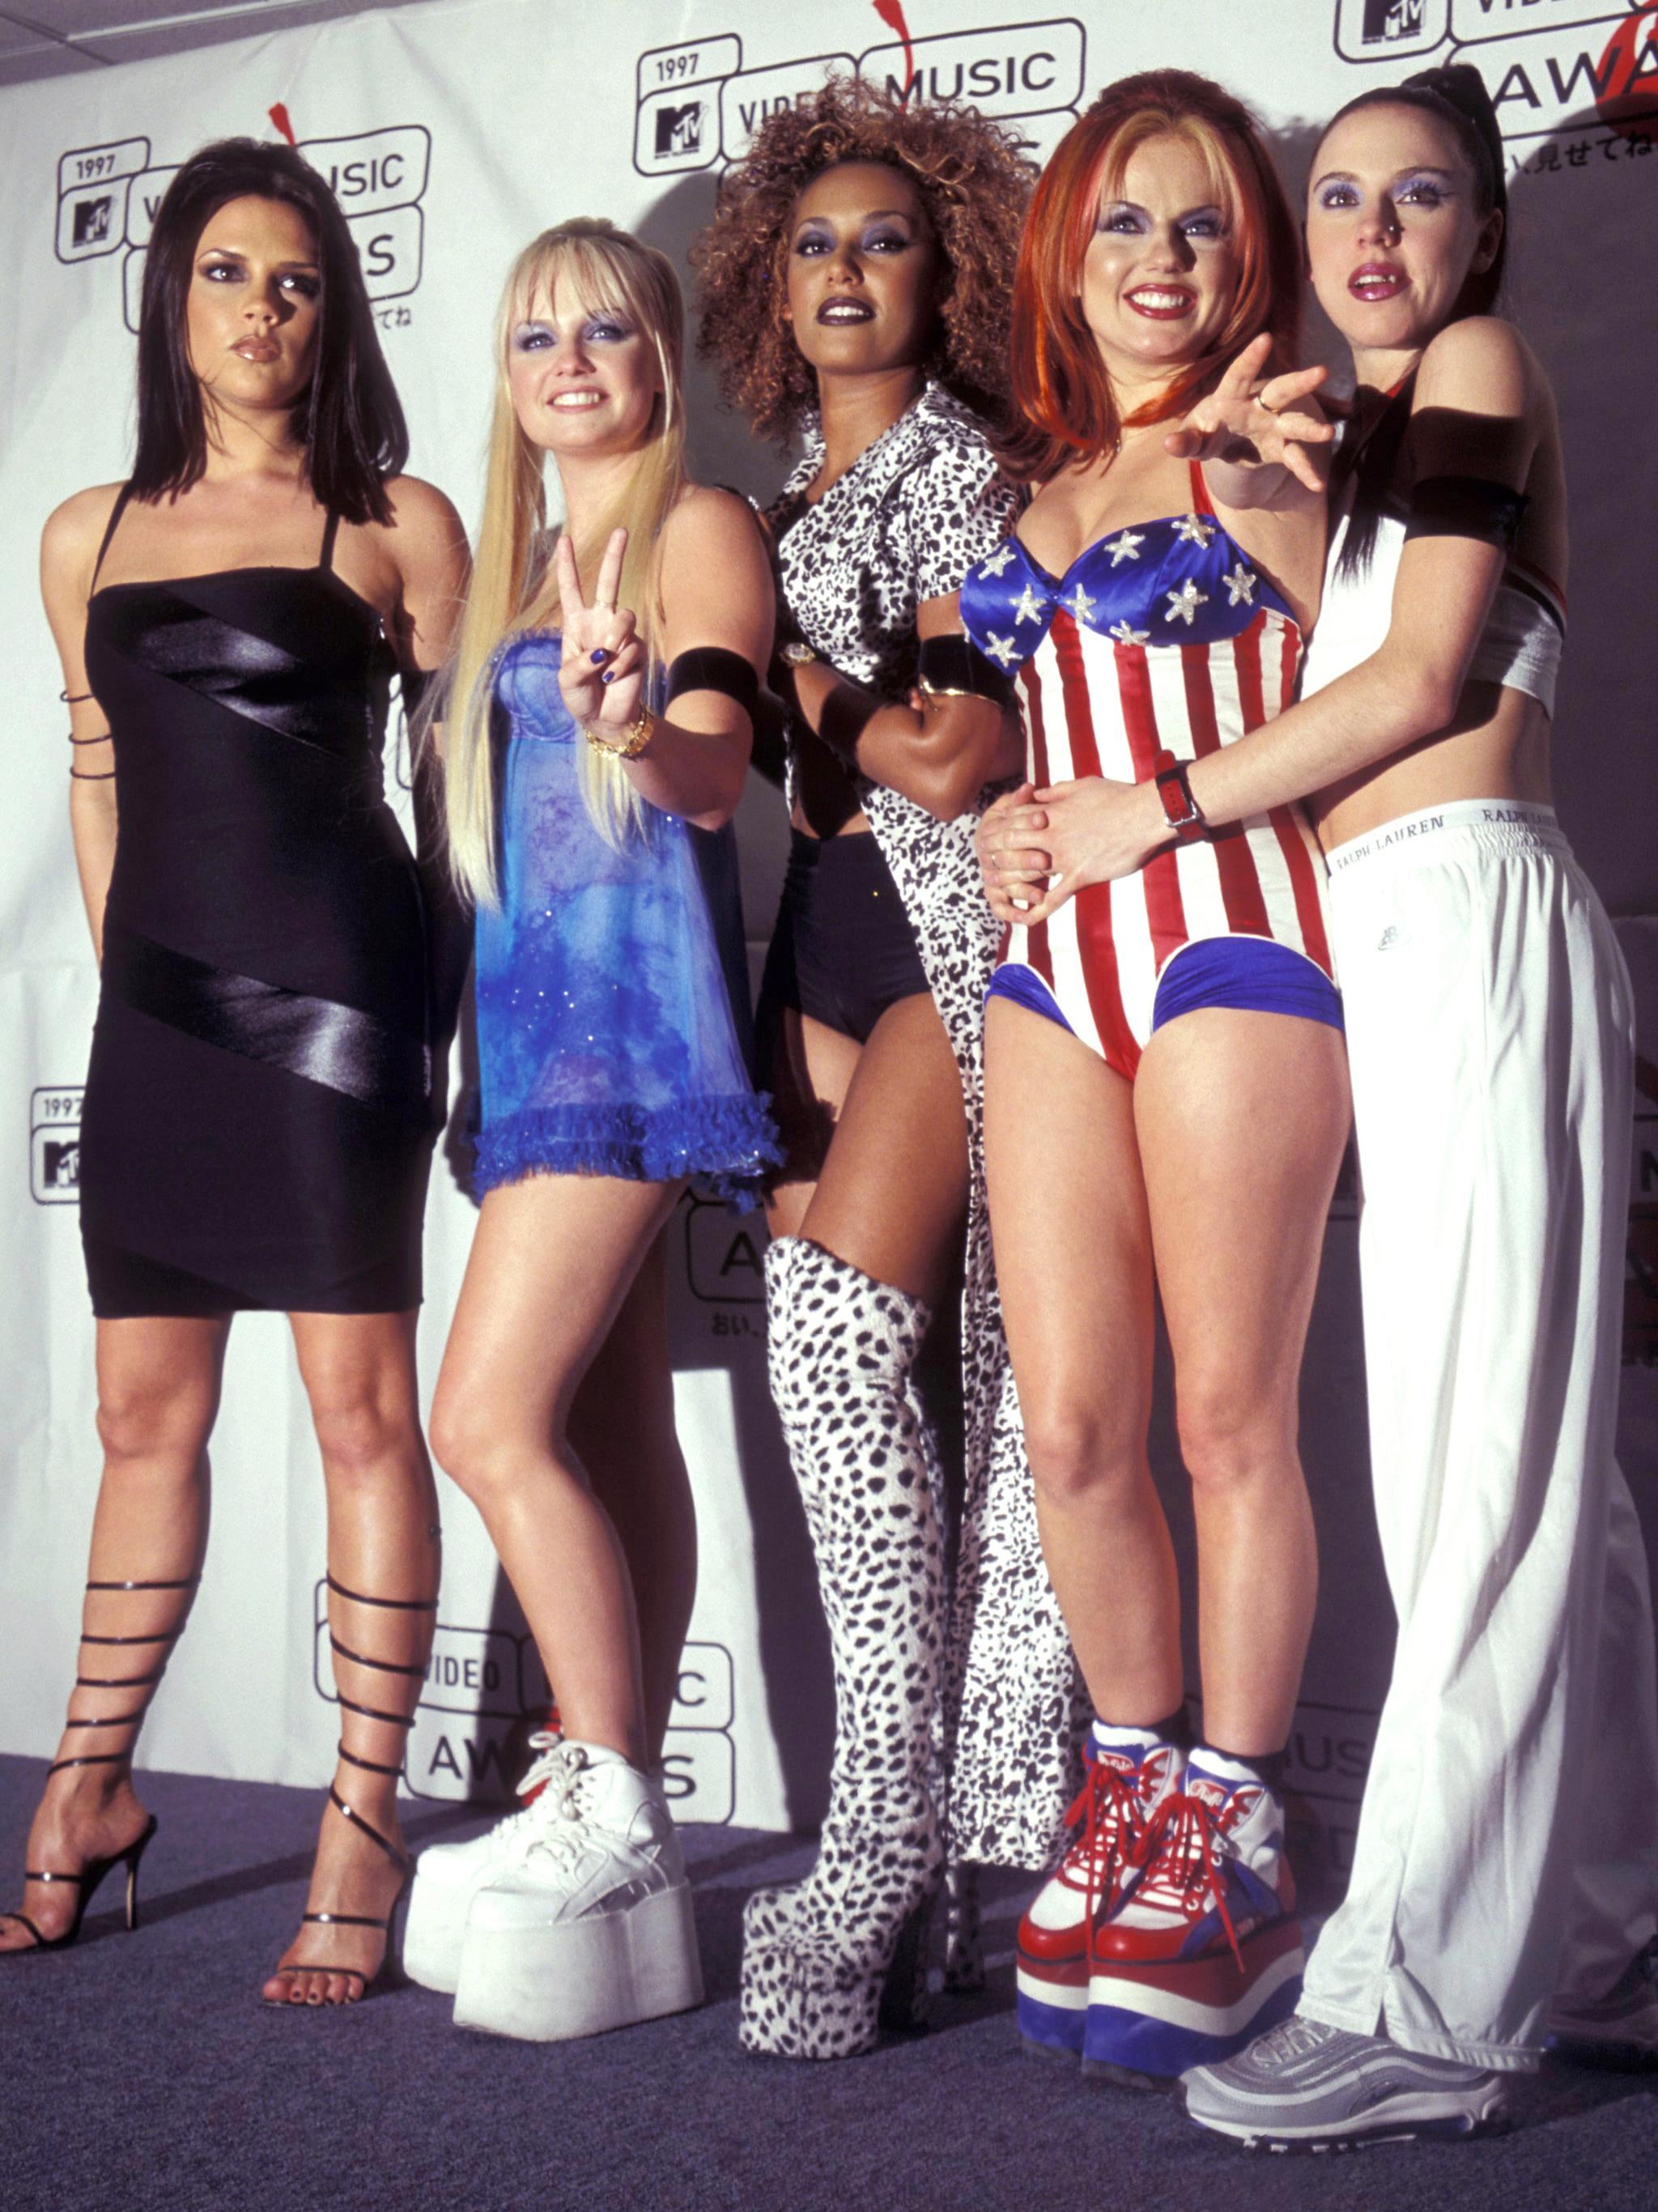 Les Spice Girls 1997